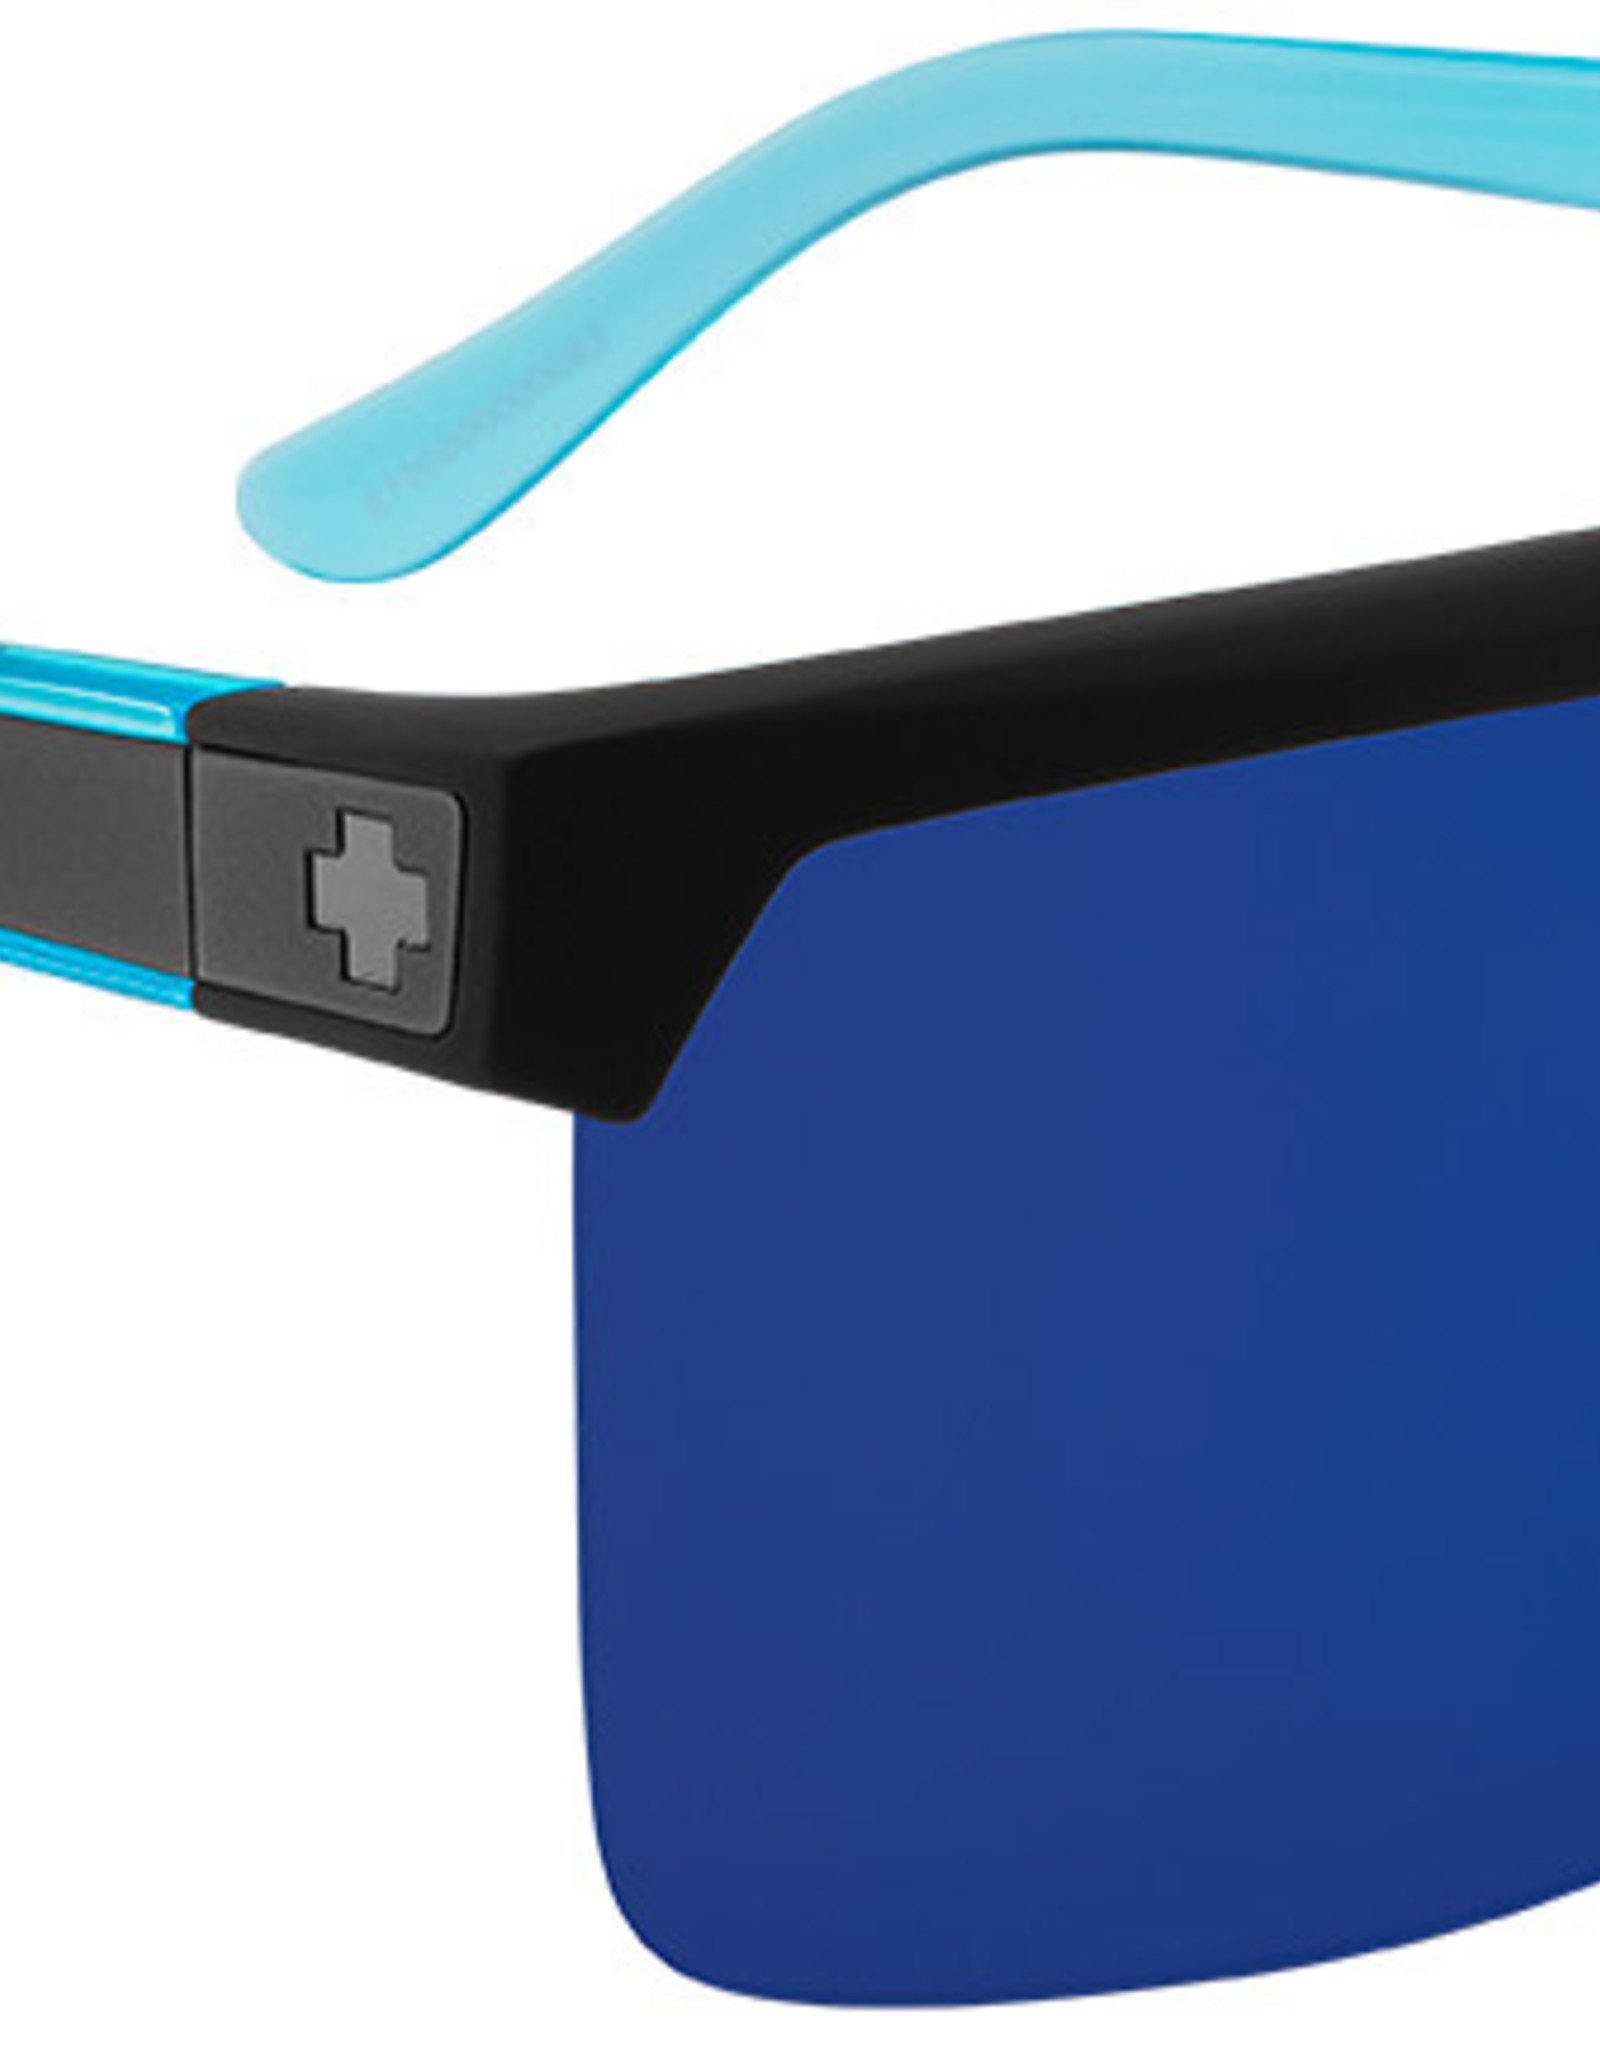 SPY Flynn 5050soft matte blk translucent blue hdplus